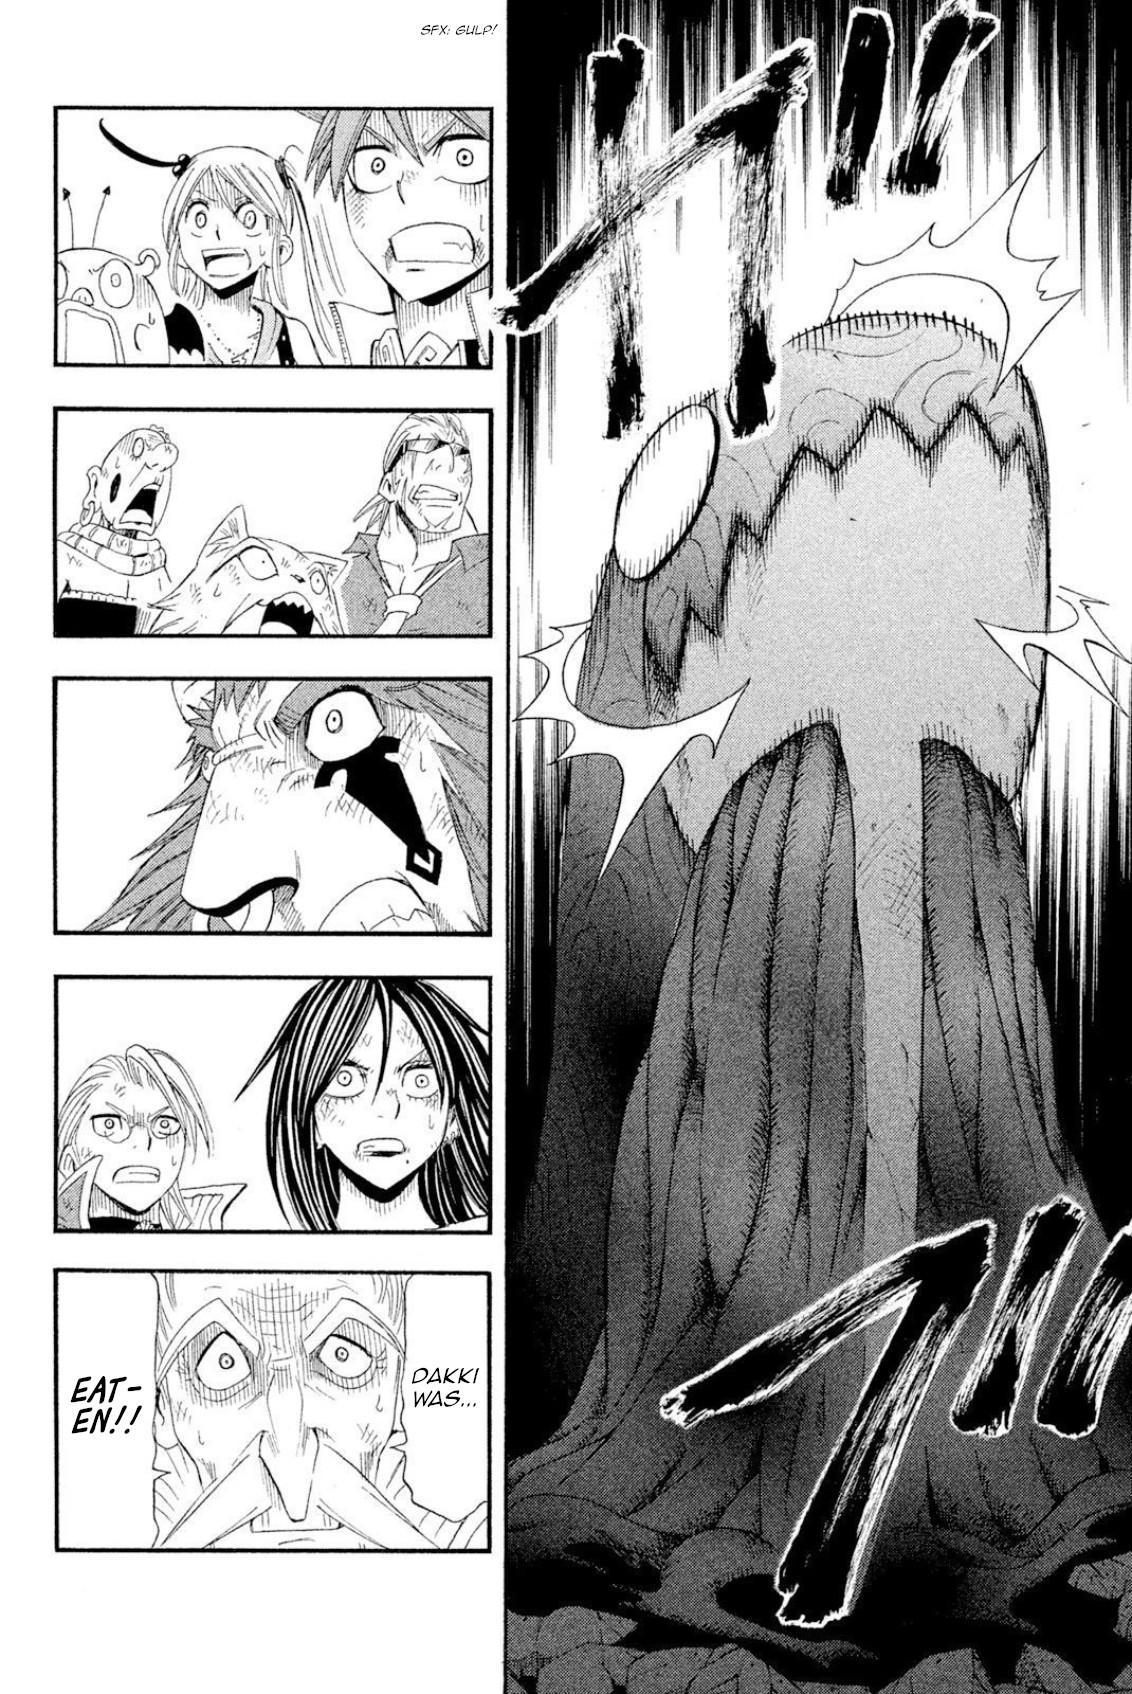 Buster Keel! Chapter 40: Feast Of God (Part 5) page 32 - Mangakakalots.com